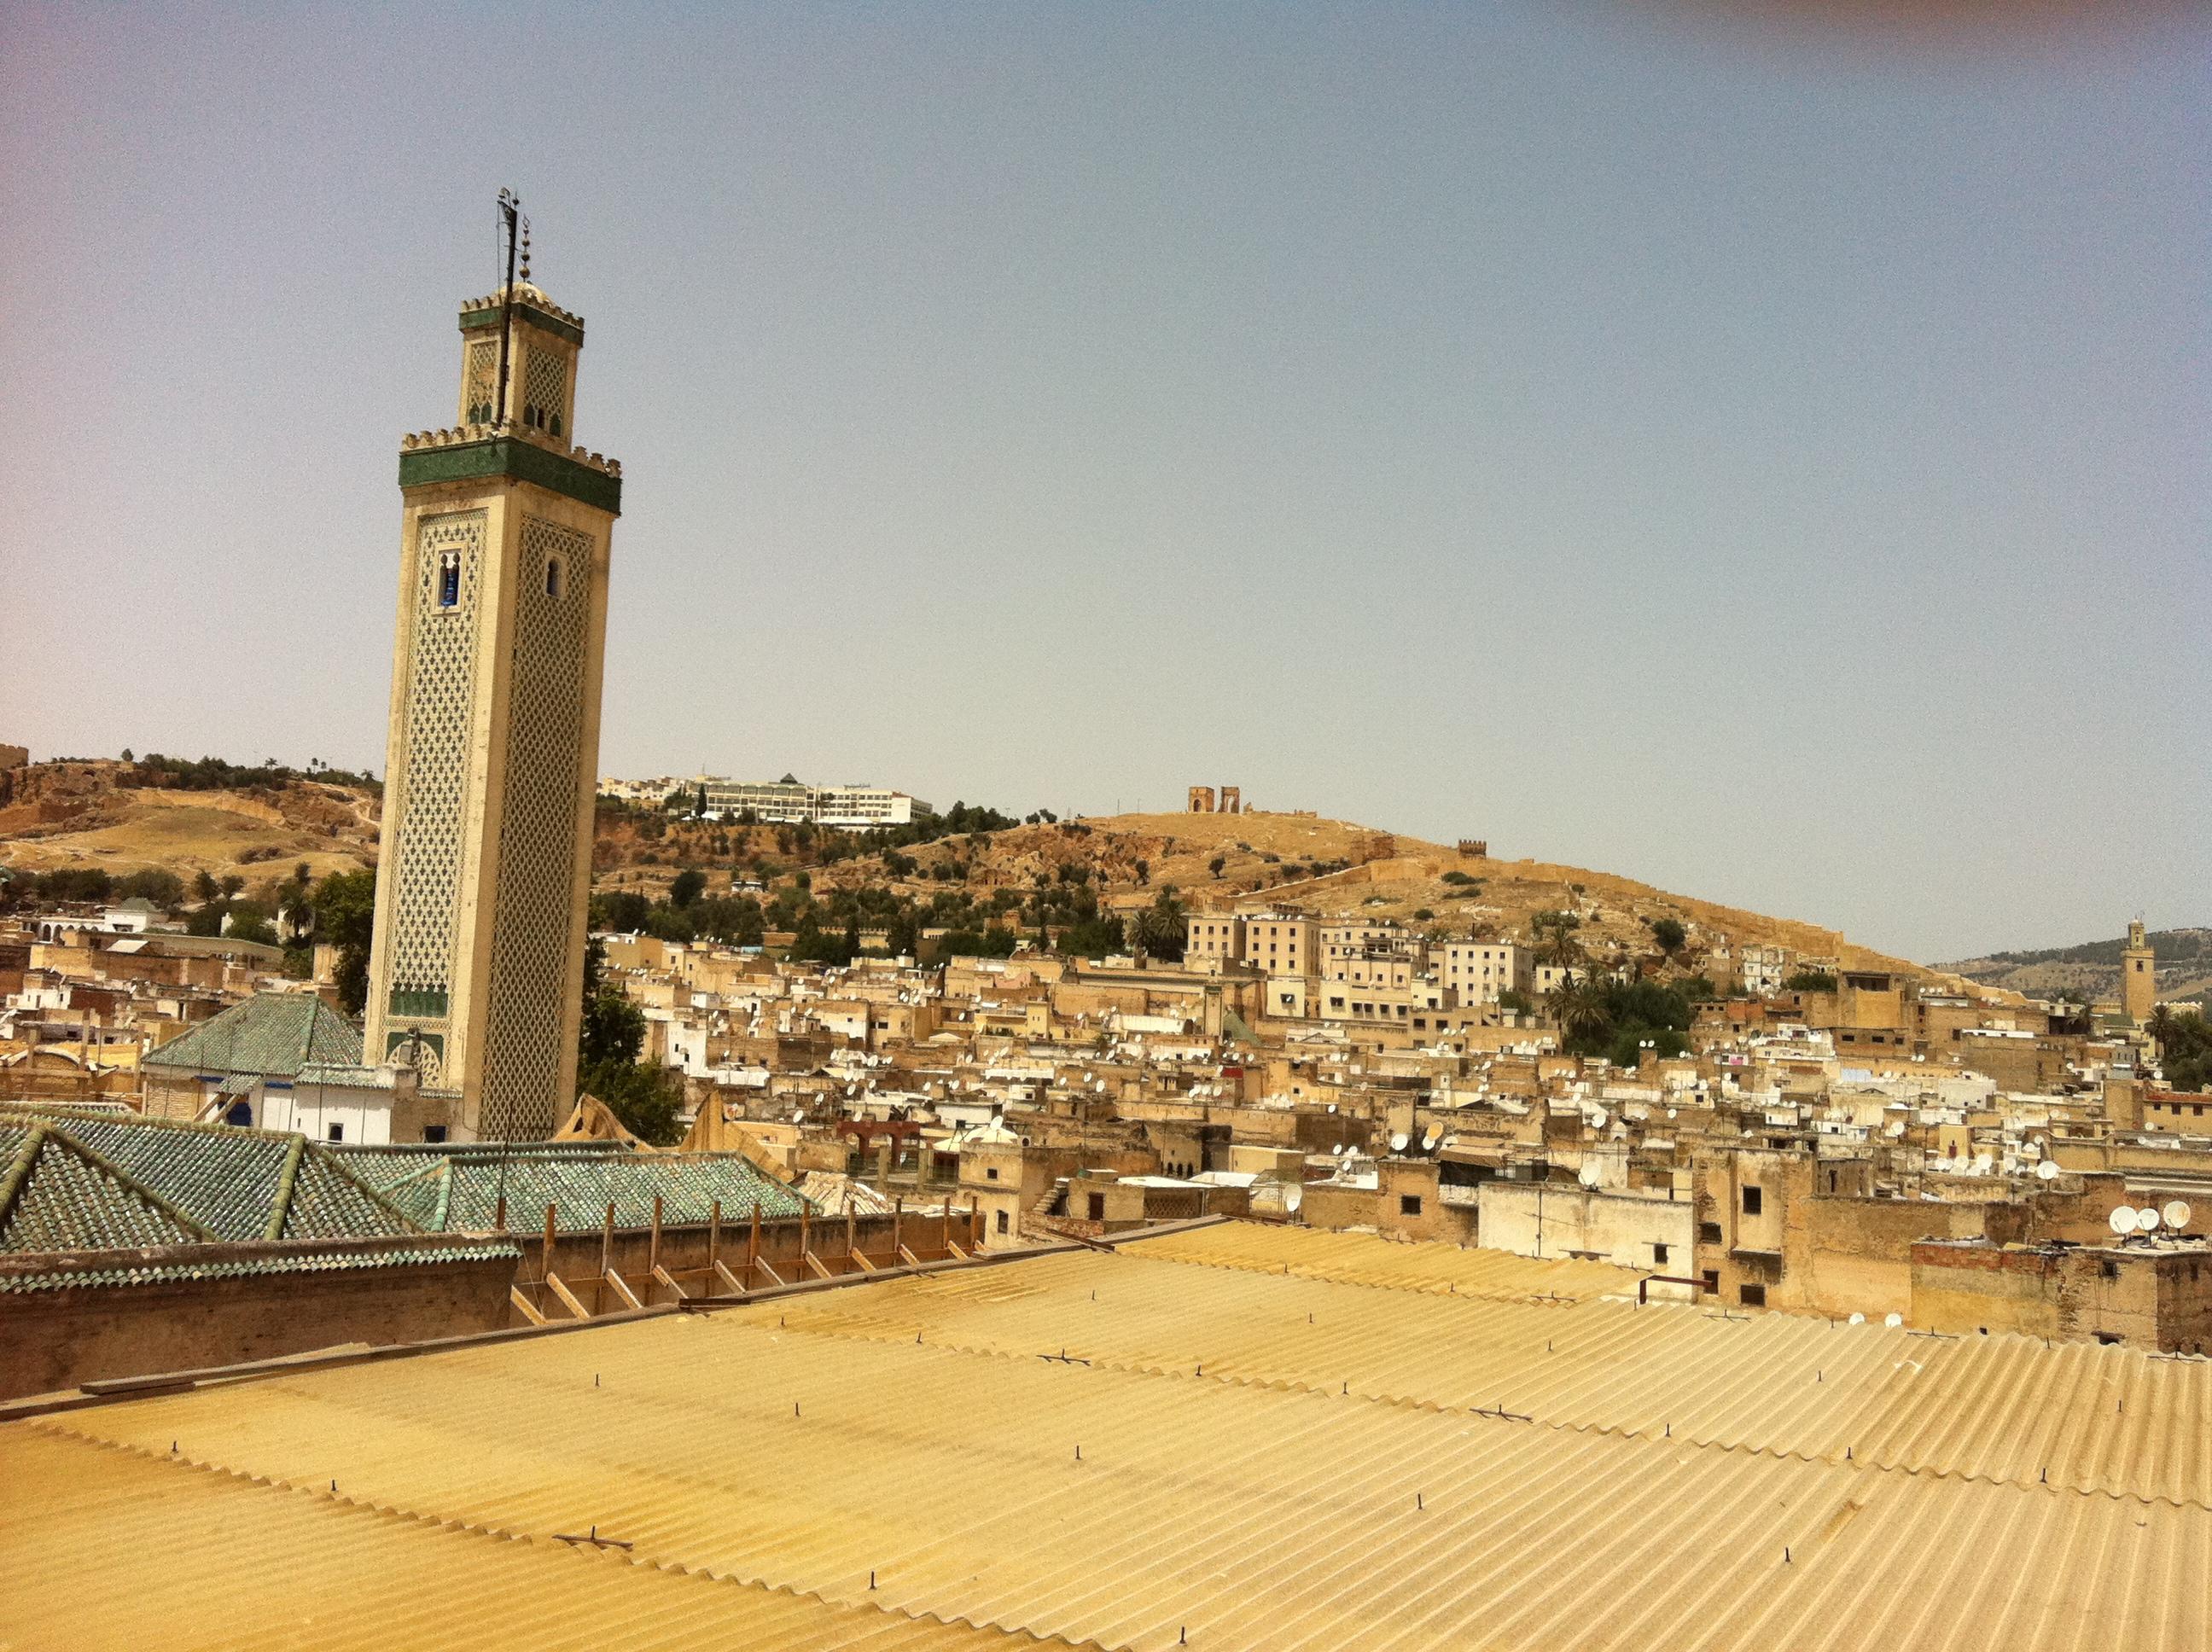 9hab algerie chouha 2013 newhibatubecom - 3 9